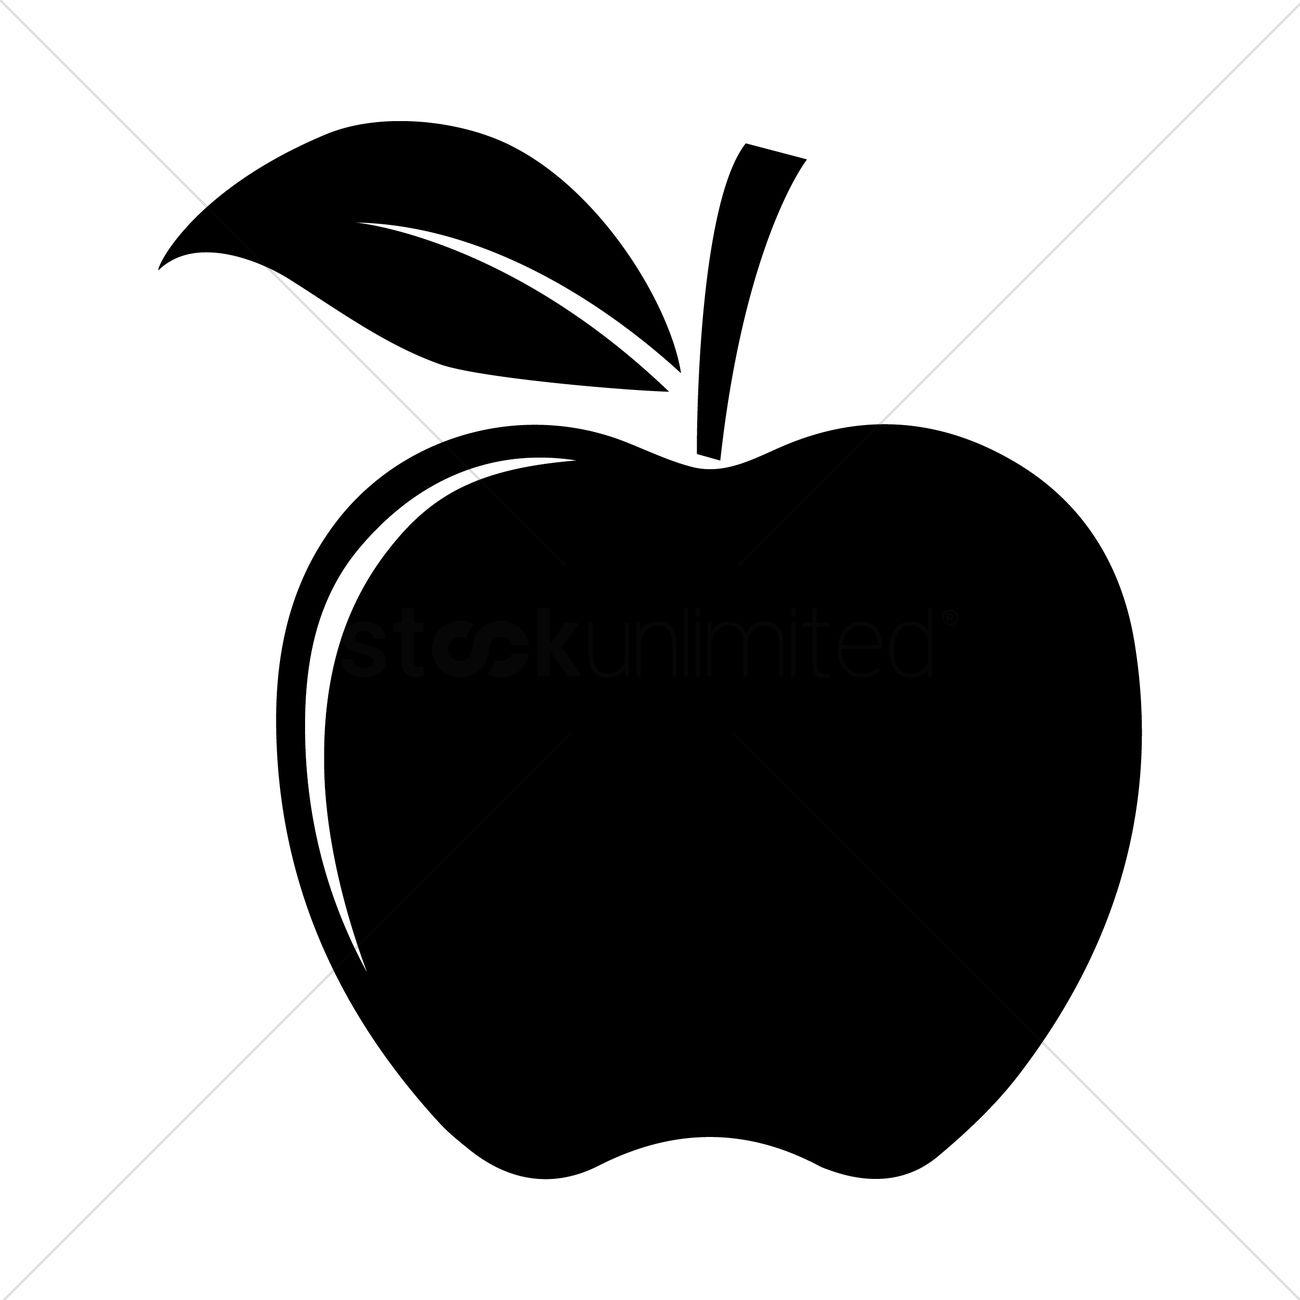 Apple silhouette Vector Image.